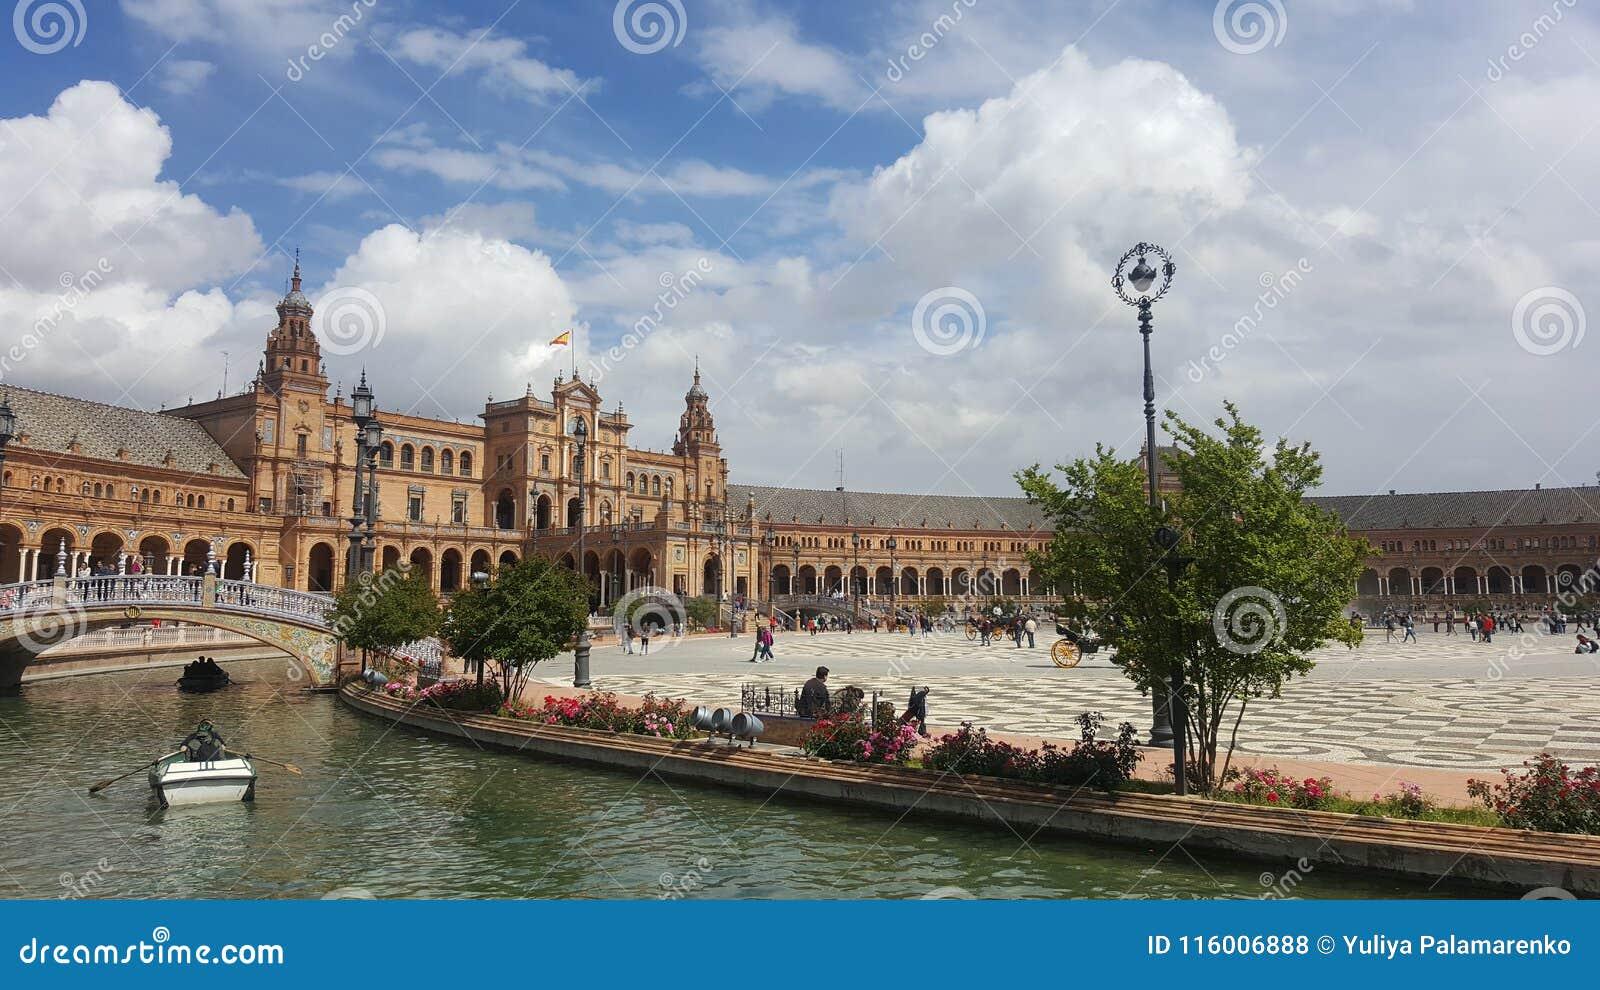 Seville Palace Square. Bright Sky